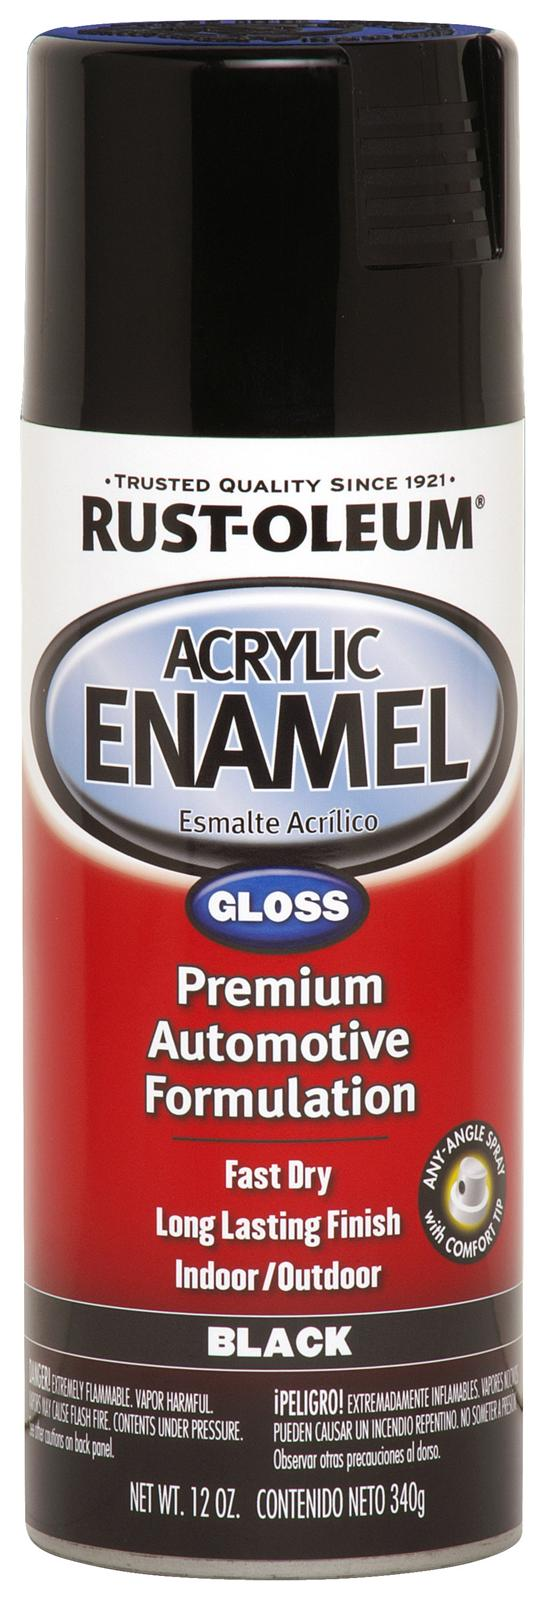 rust oleum paint acrylic enamel gloss black 12 oz aerosol ea 248643. Black Bedroom Furniture Sets. Home Design Ideas